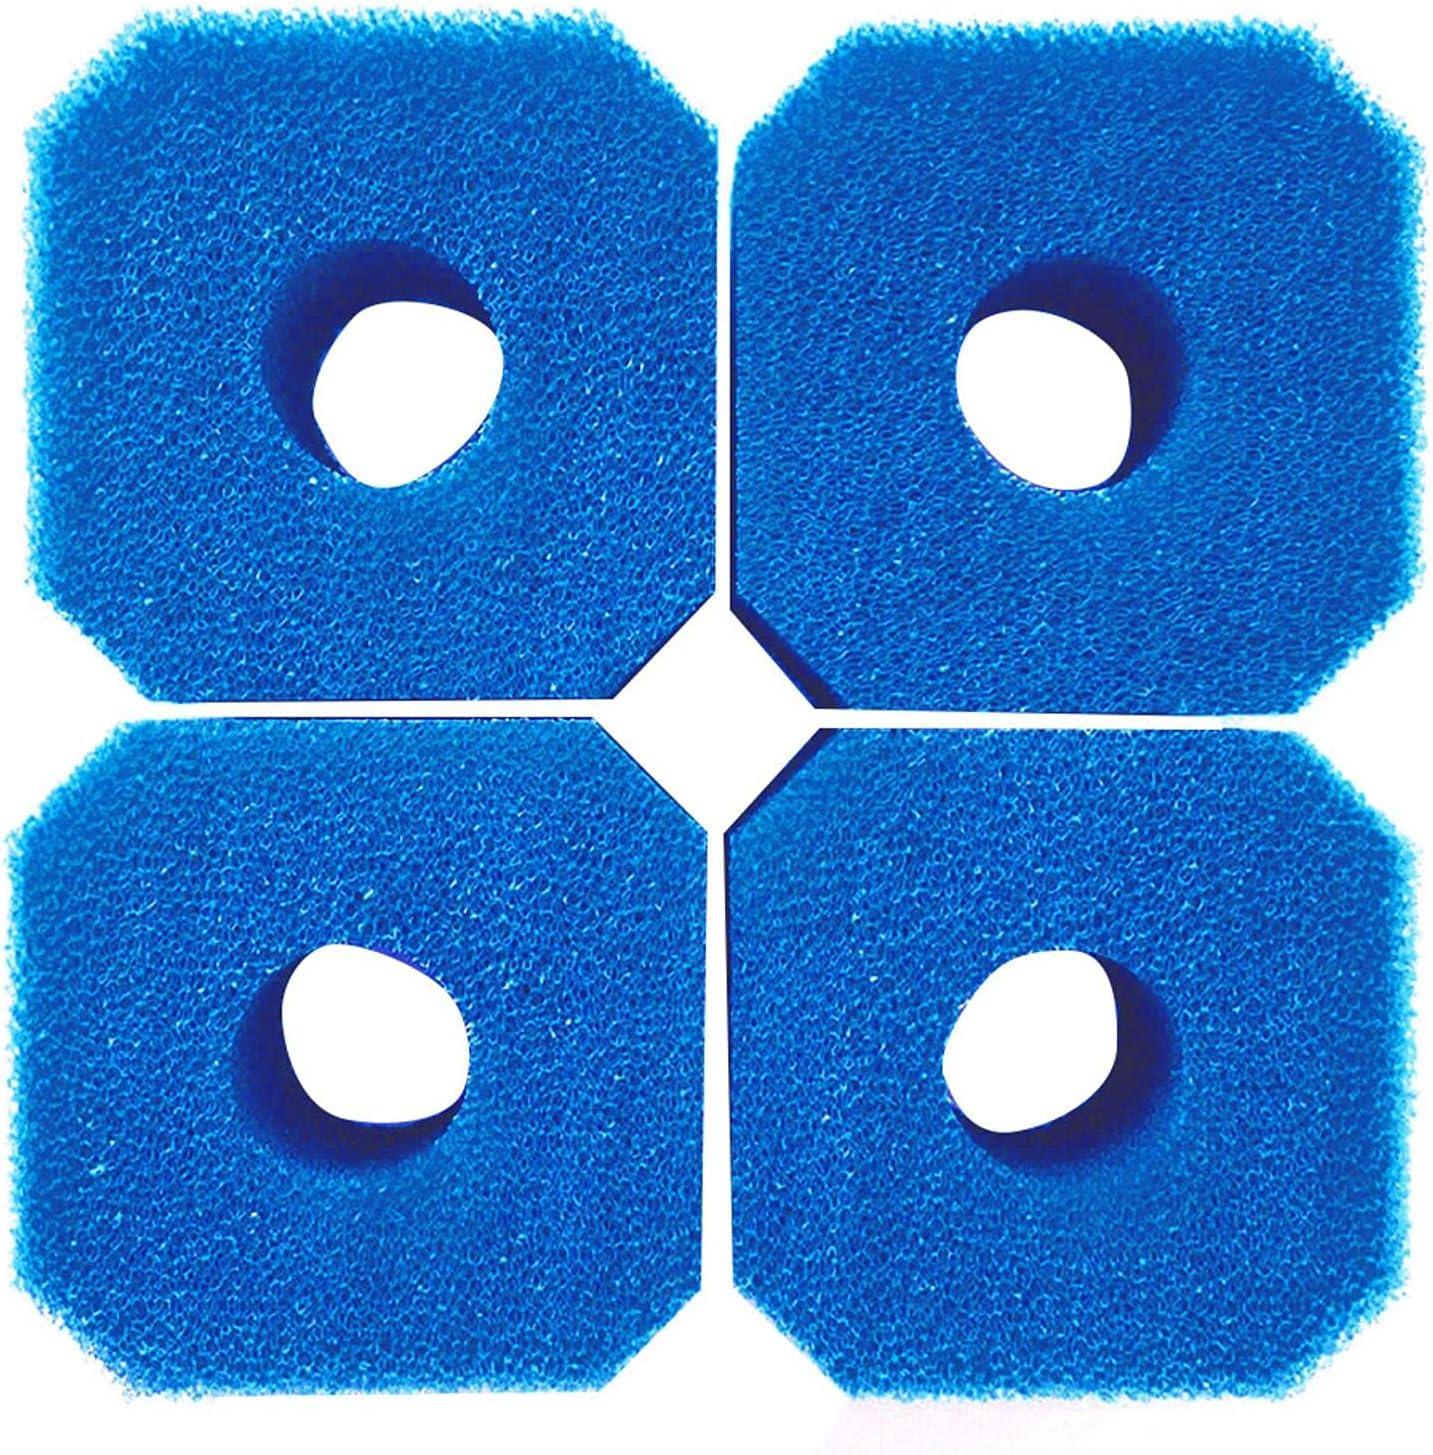 EMEZ Swimming Pool Sponge Column Tube Filter Suit Latest item Popularity